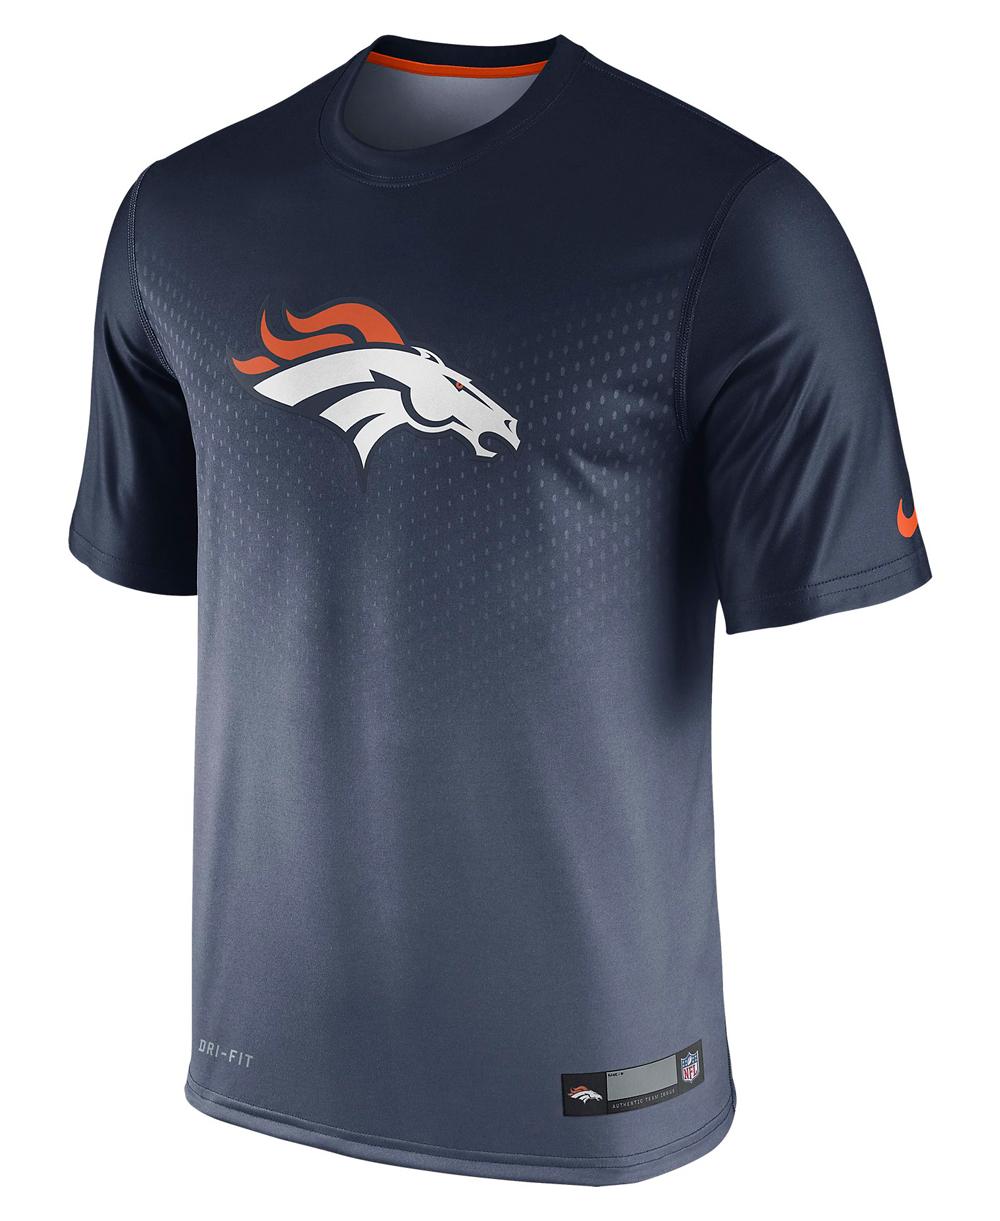 Legend Sideline T-Shirt à Manches Courtes Homme NFL Denver Broncos